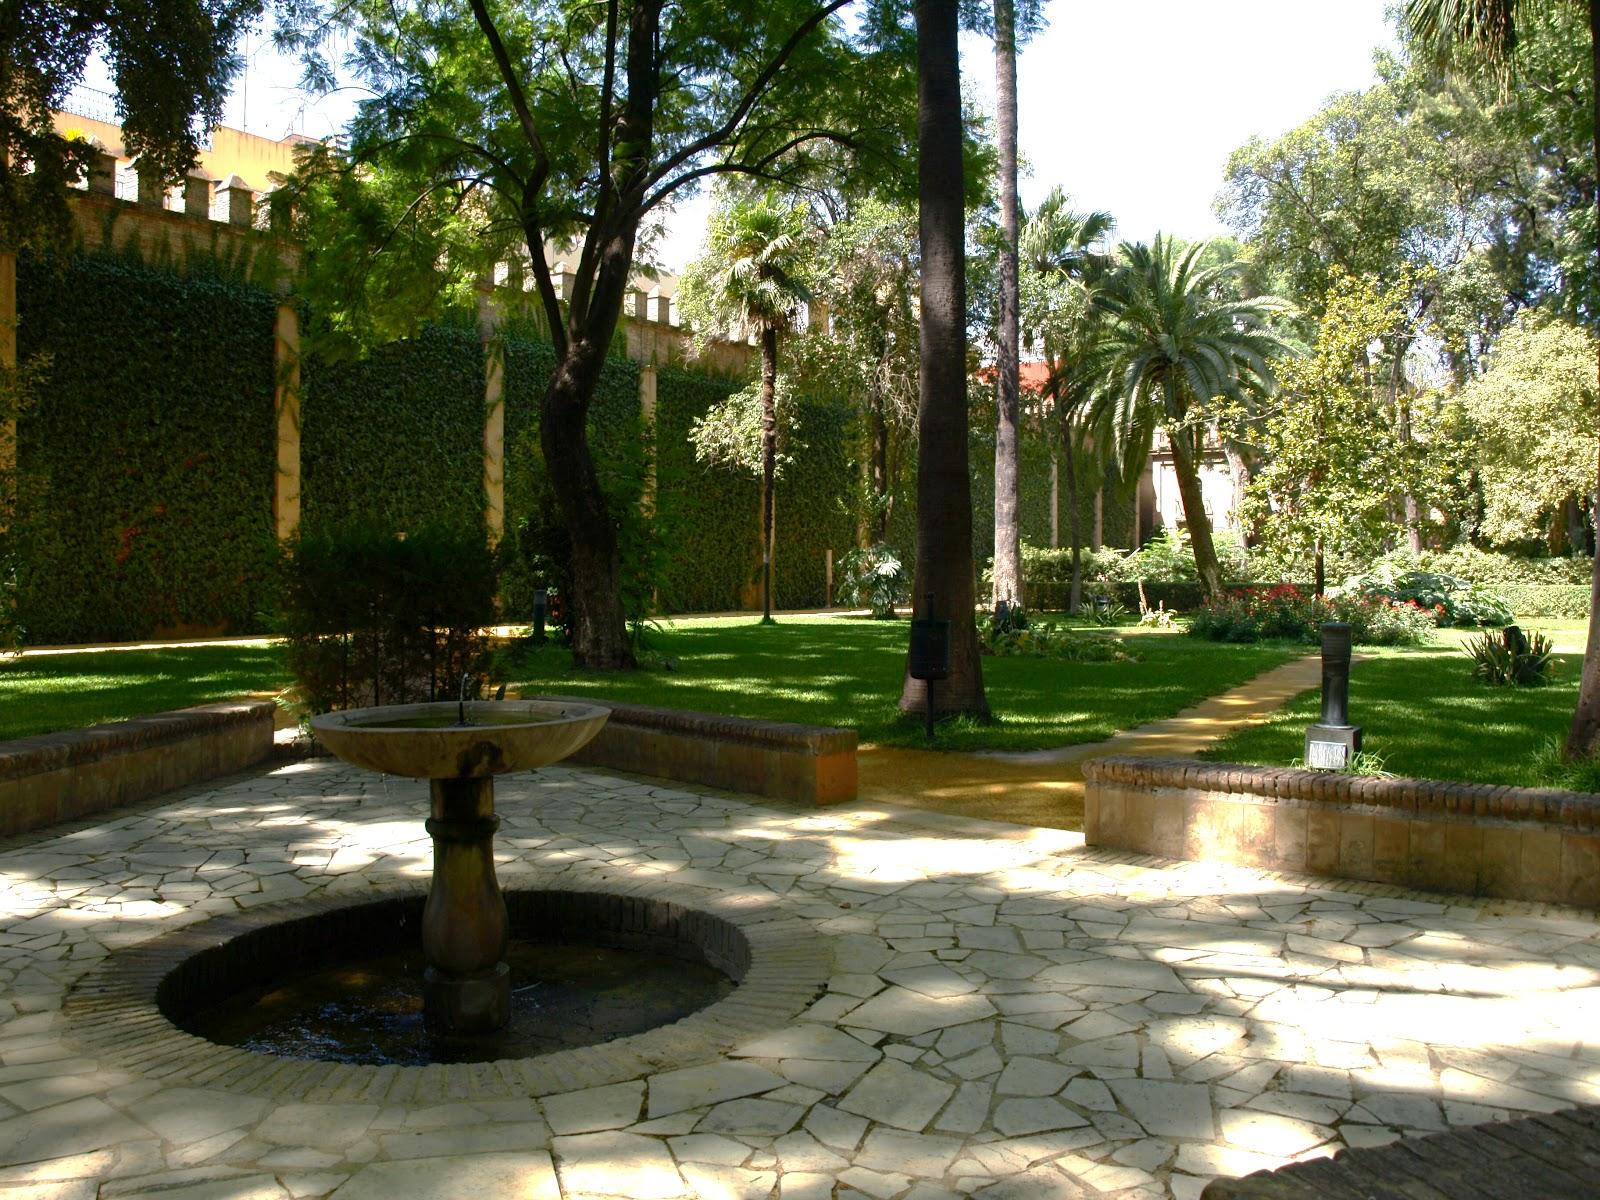 Sevilla daily photo alc zar 39 el jard n ingl s for Jardin en ingles